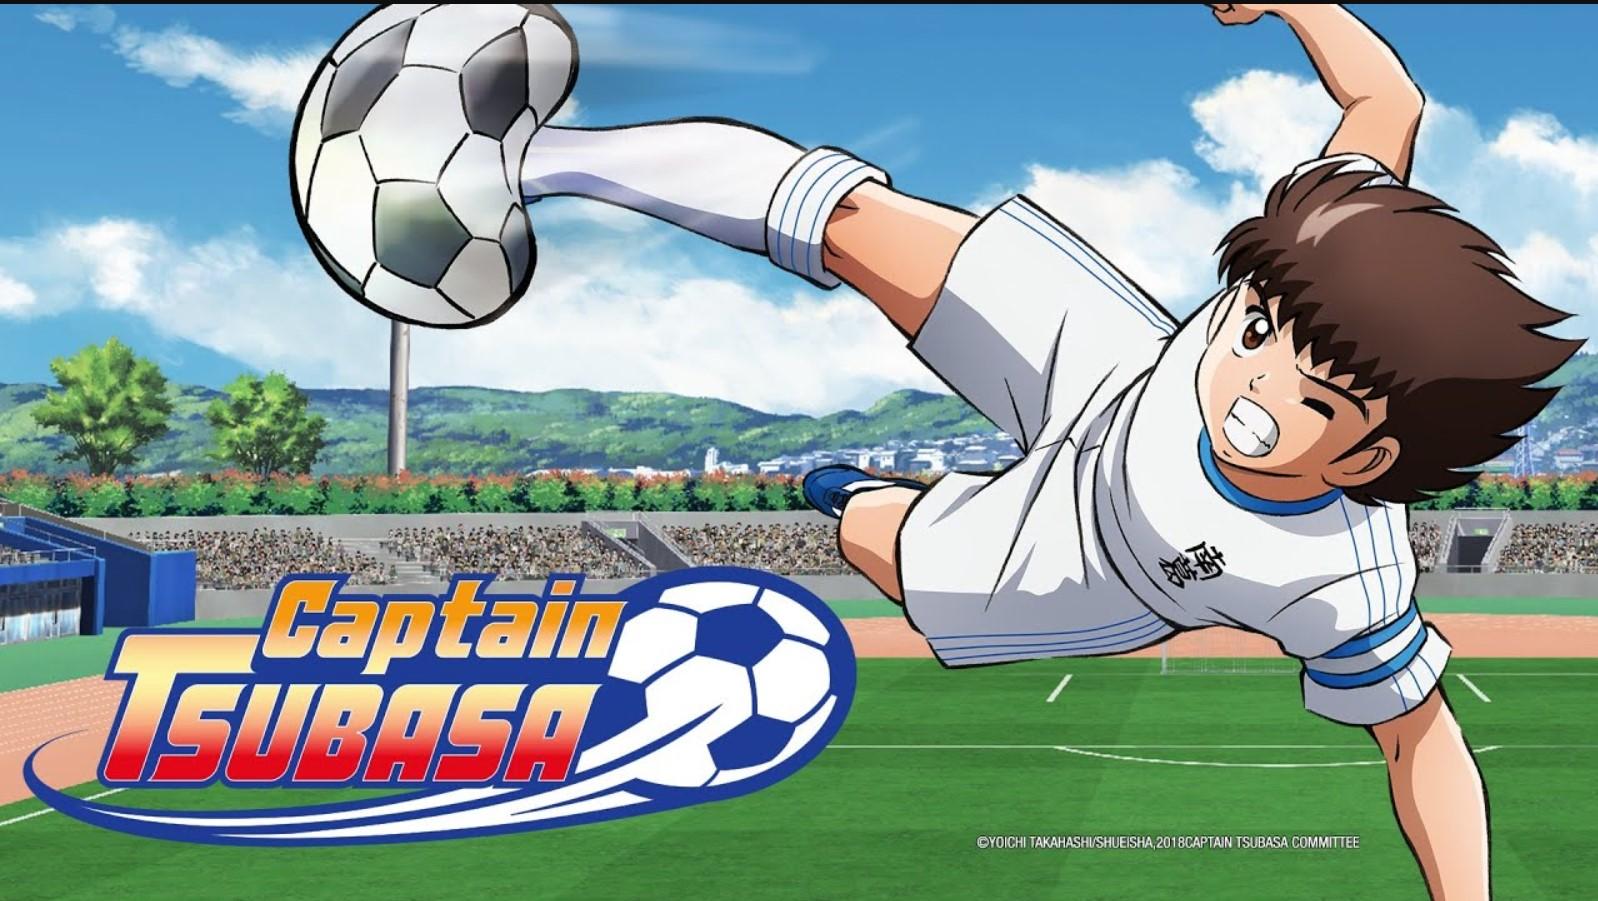 Captain Tsubasa- best football anime